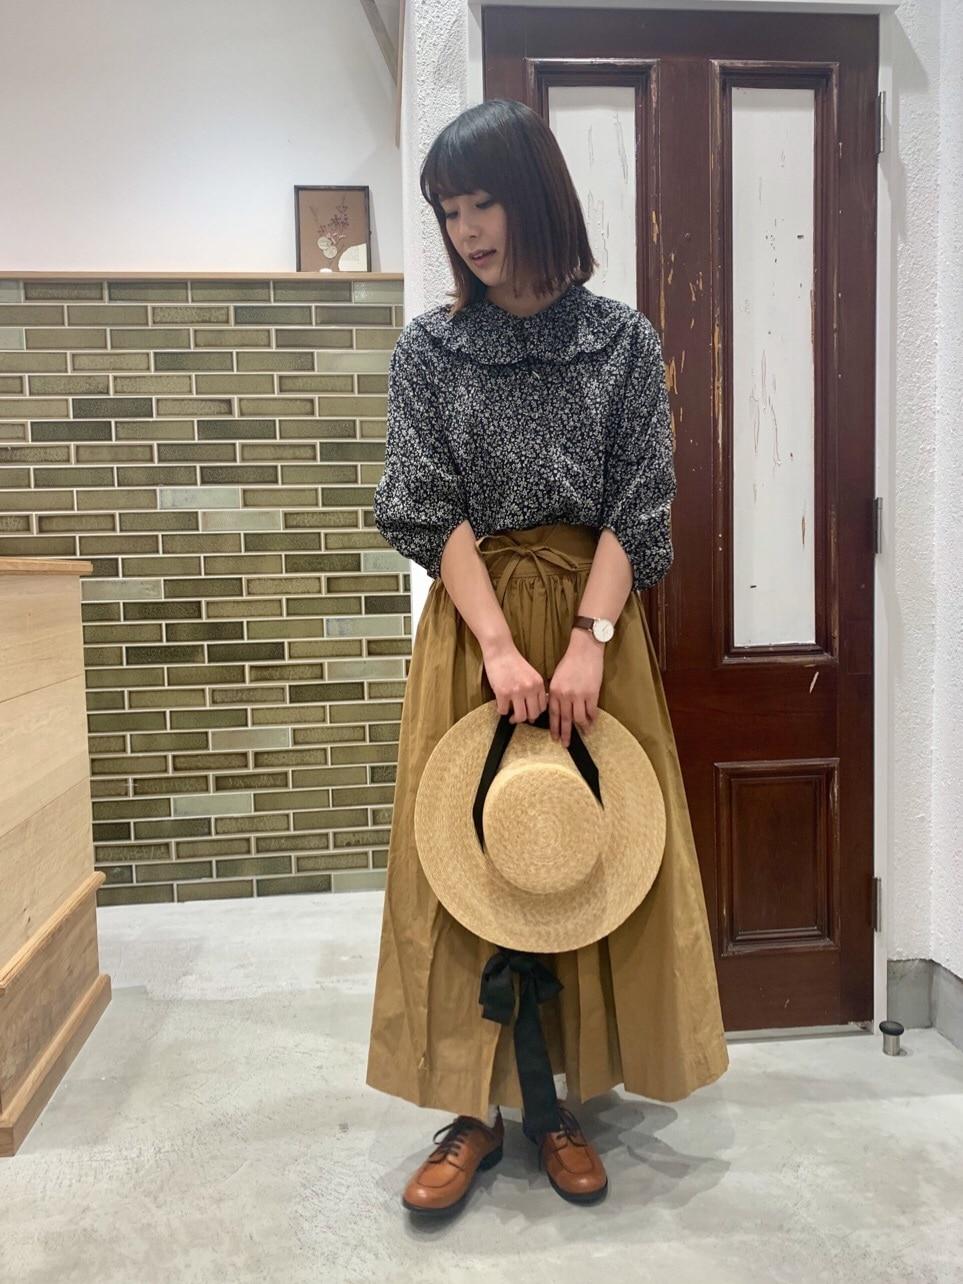 chambre de charme 横浜ジョイナス 身長:162cm 2020.04.06